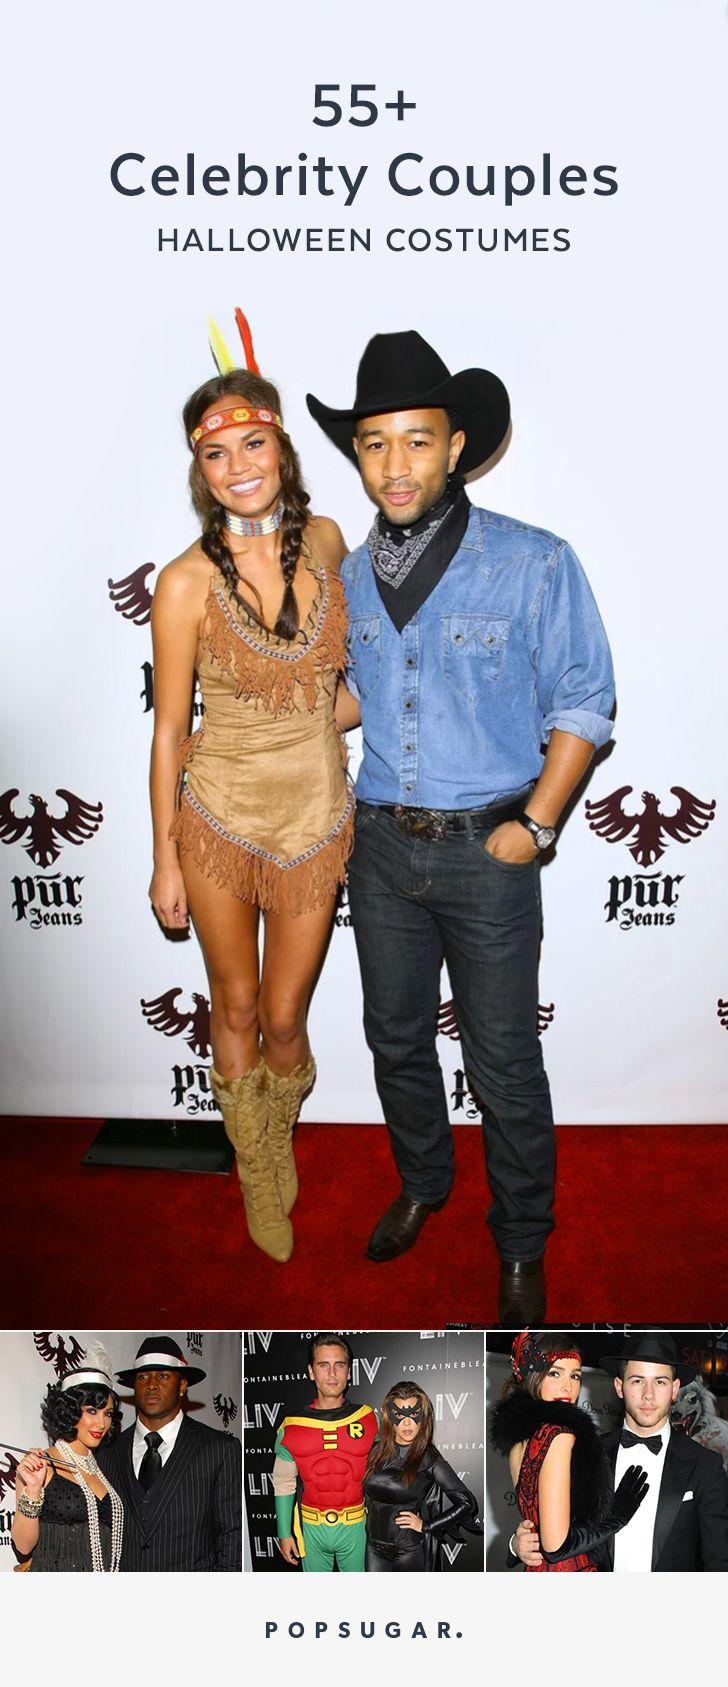 70+ Celebrity Couples Halloween Costumes | Heres, Celebrity ...